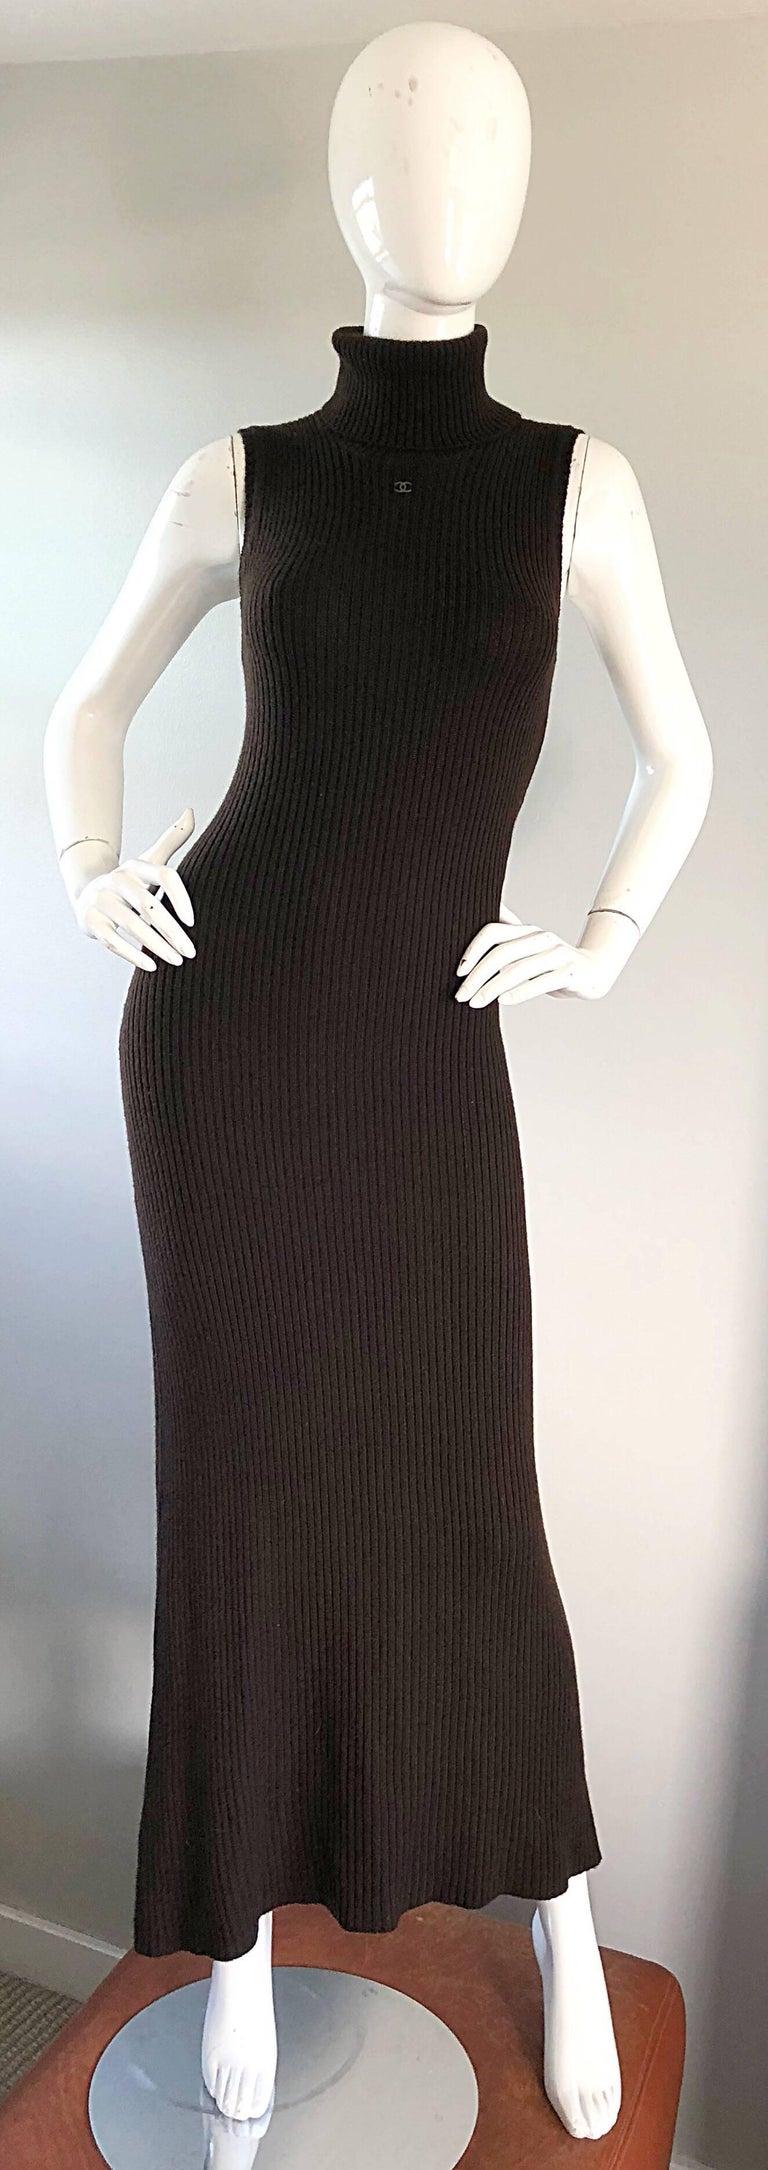 Chanel Vintage 99A Espresso Brown Cashmere Turtleneck 1990s 90s Sweater Dress 3